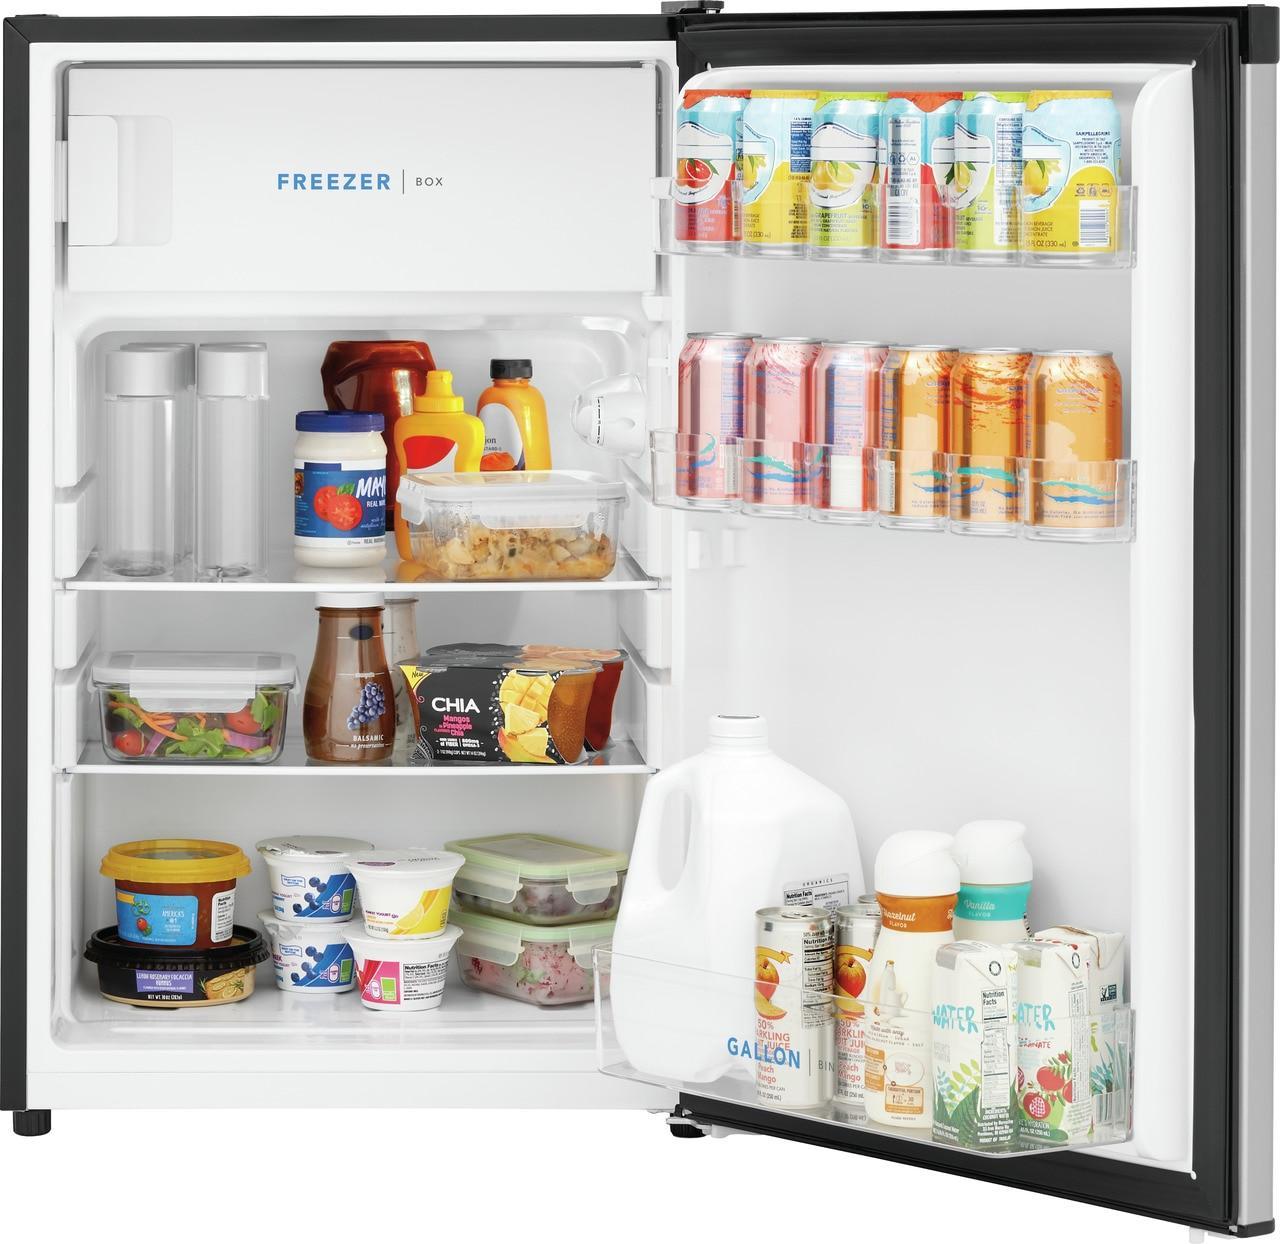 4.5 Cu. Ft. Compact Refrigerator Photo #3